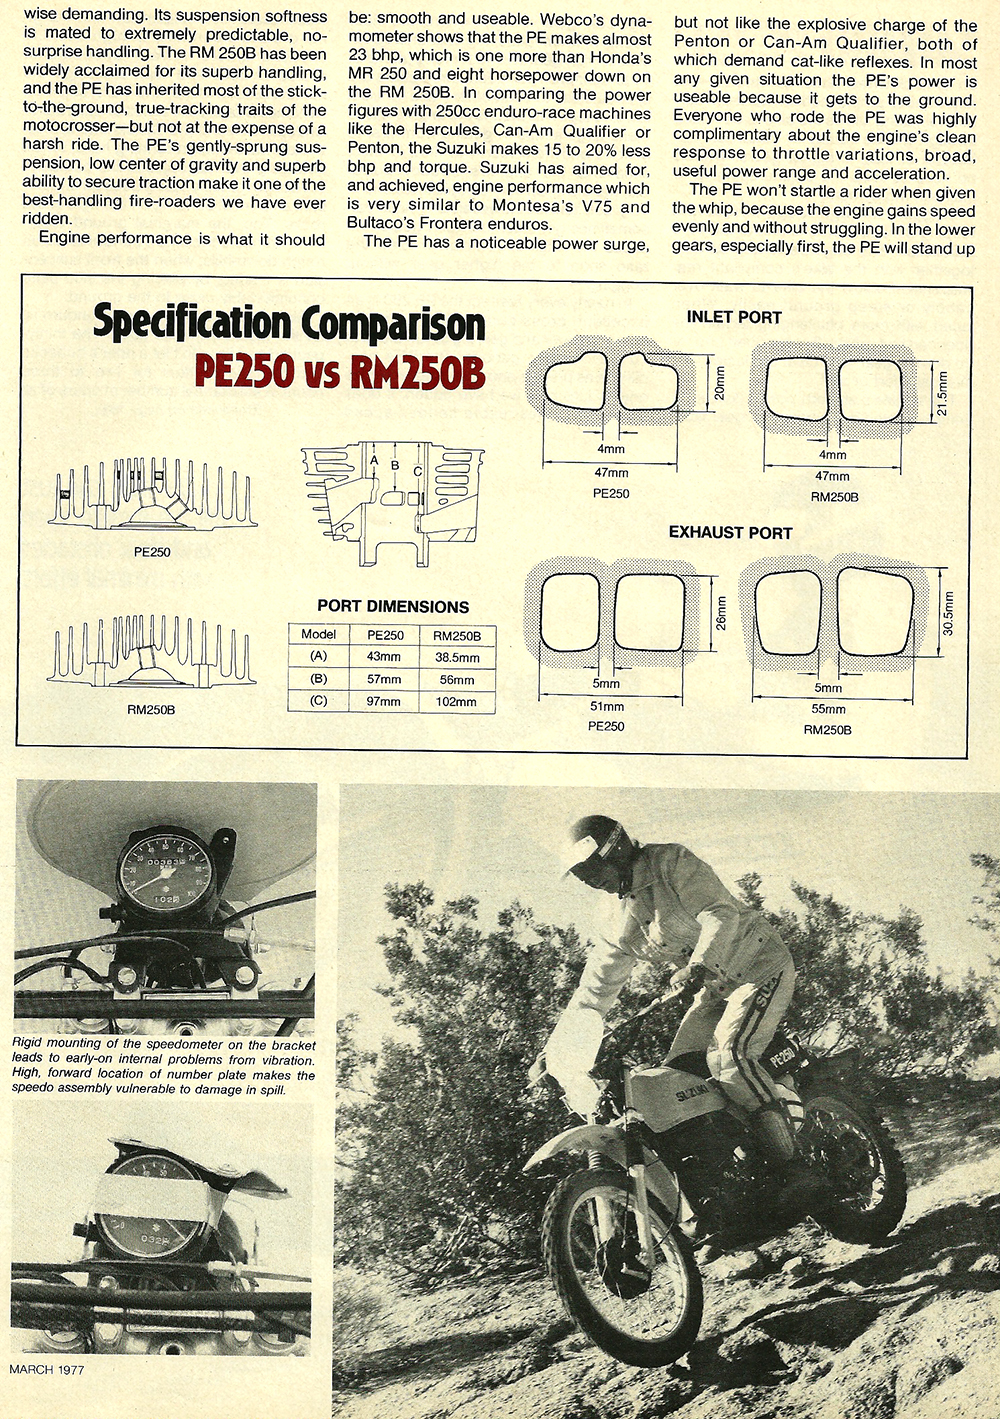 1977 Suzuki PE250 road test 4.jpg